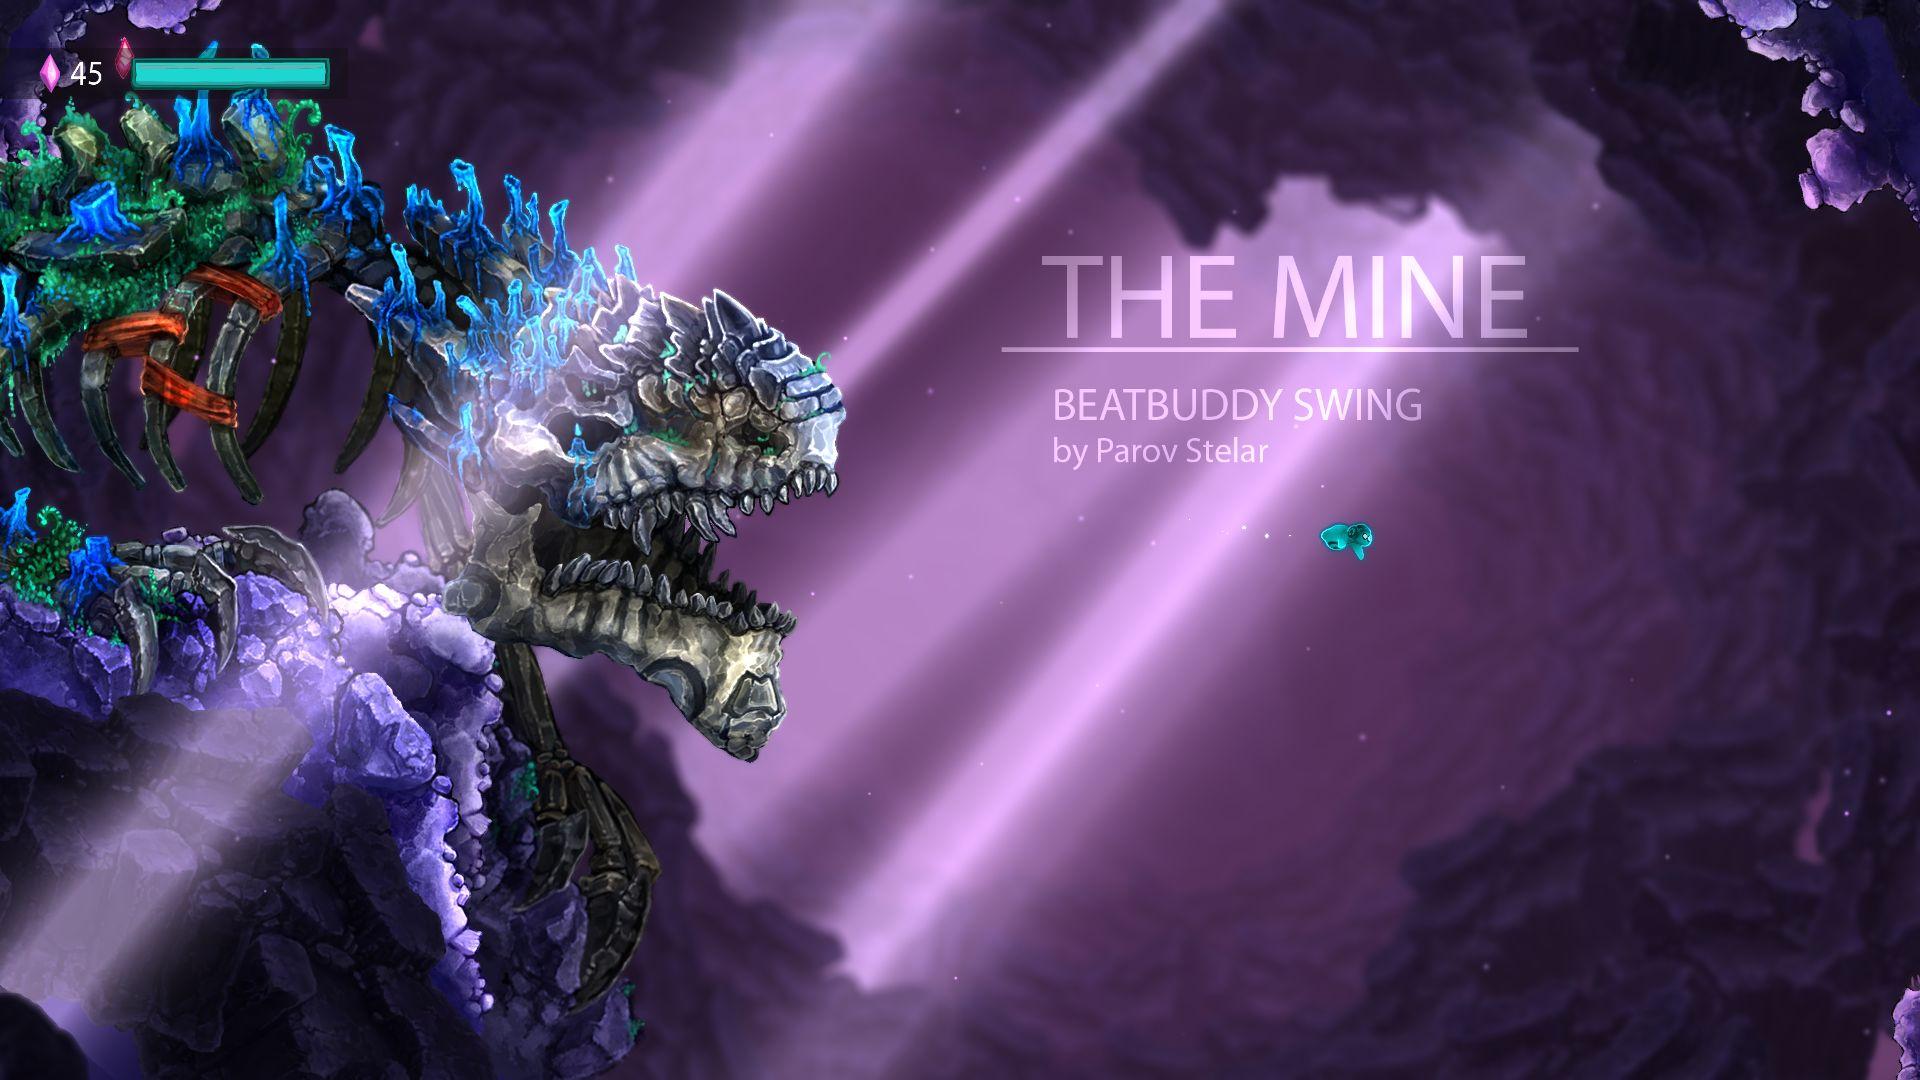 Beatbuddy_the-mine